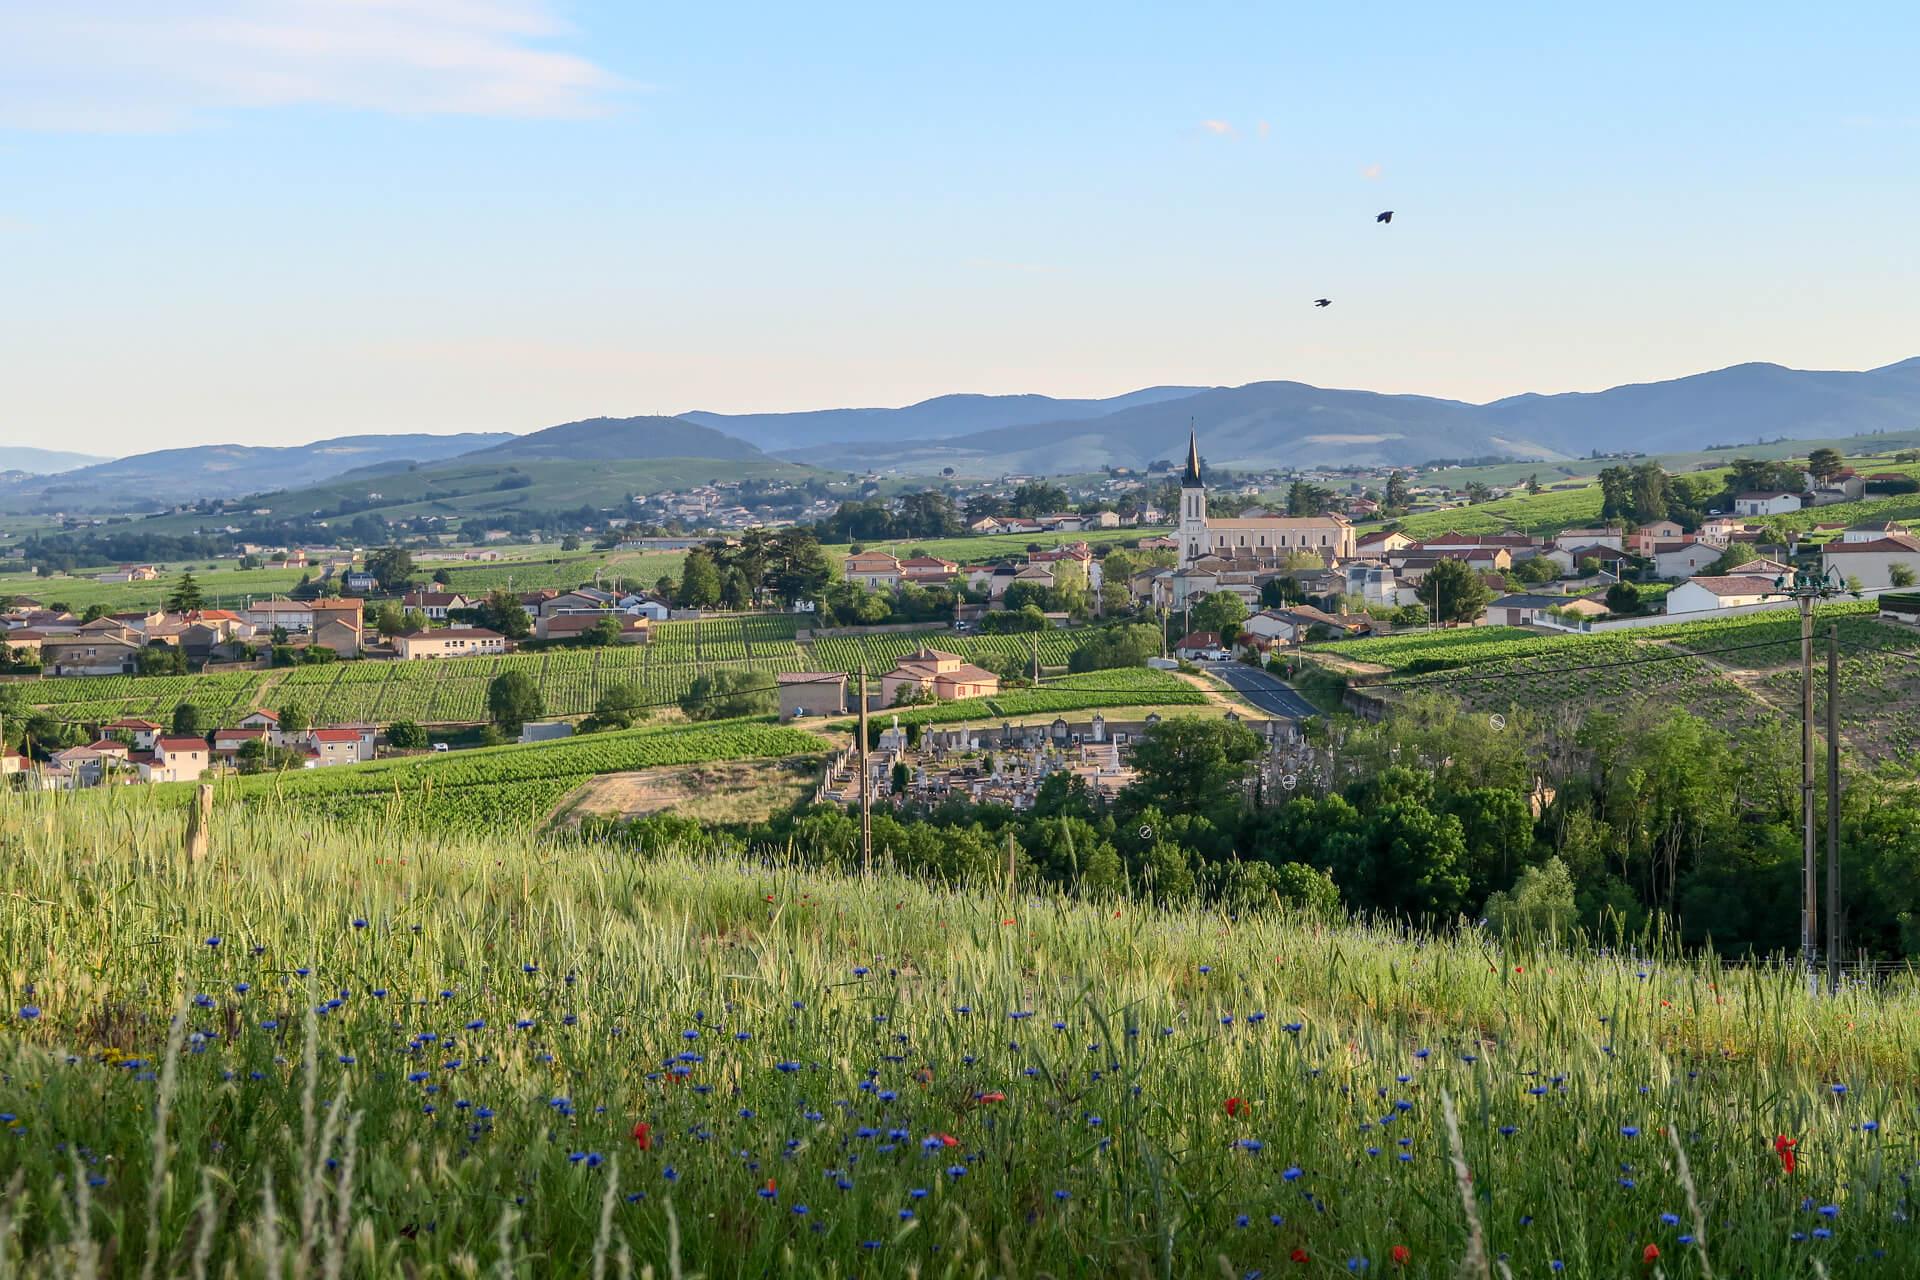 Bienvenue en Beaujonomie : week-end vin et gastronomie en Beaujolais